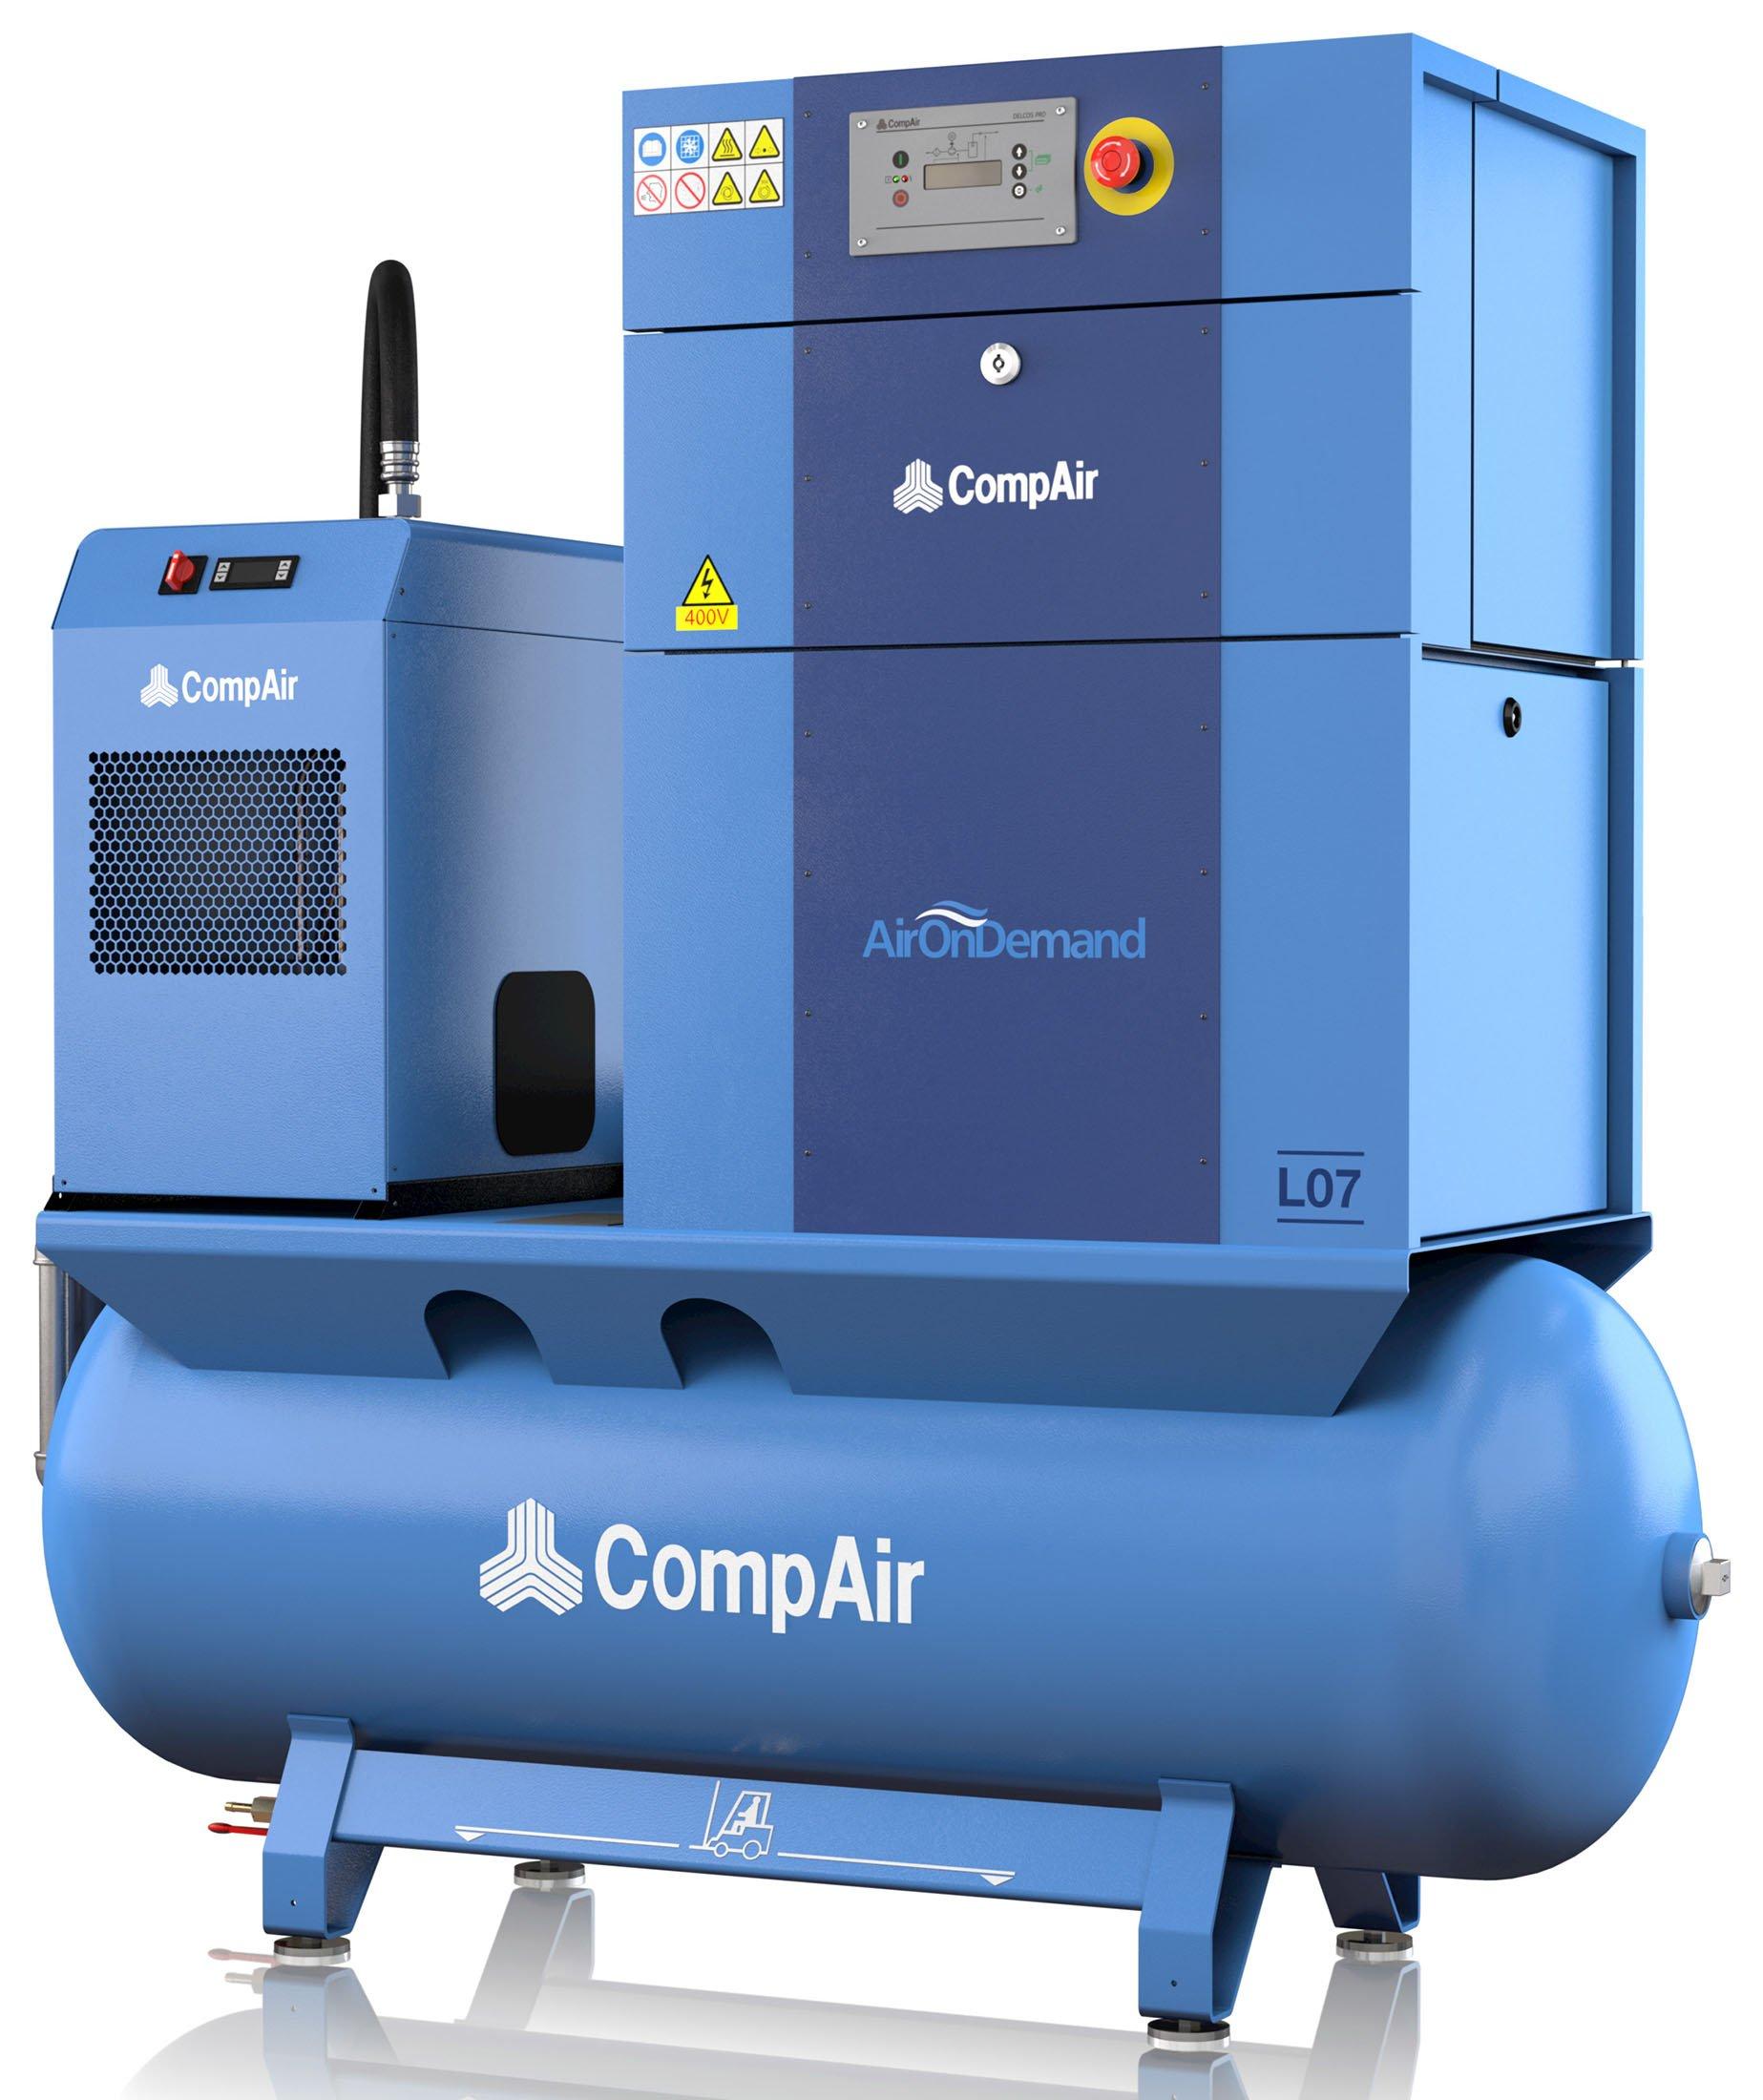 Midlands UK supplier of CompAir L07 AirStation air compressor